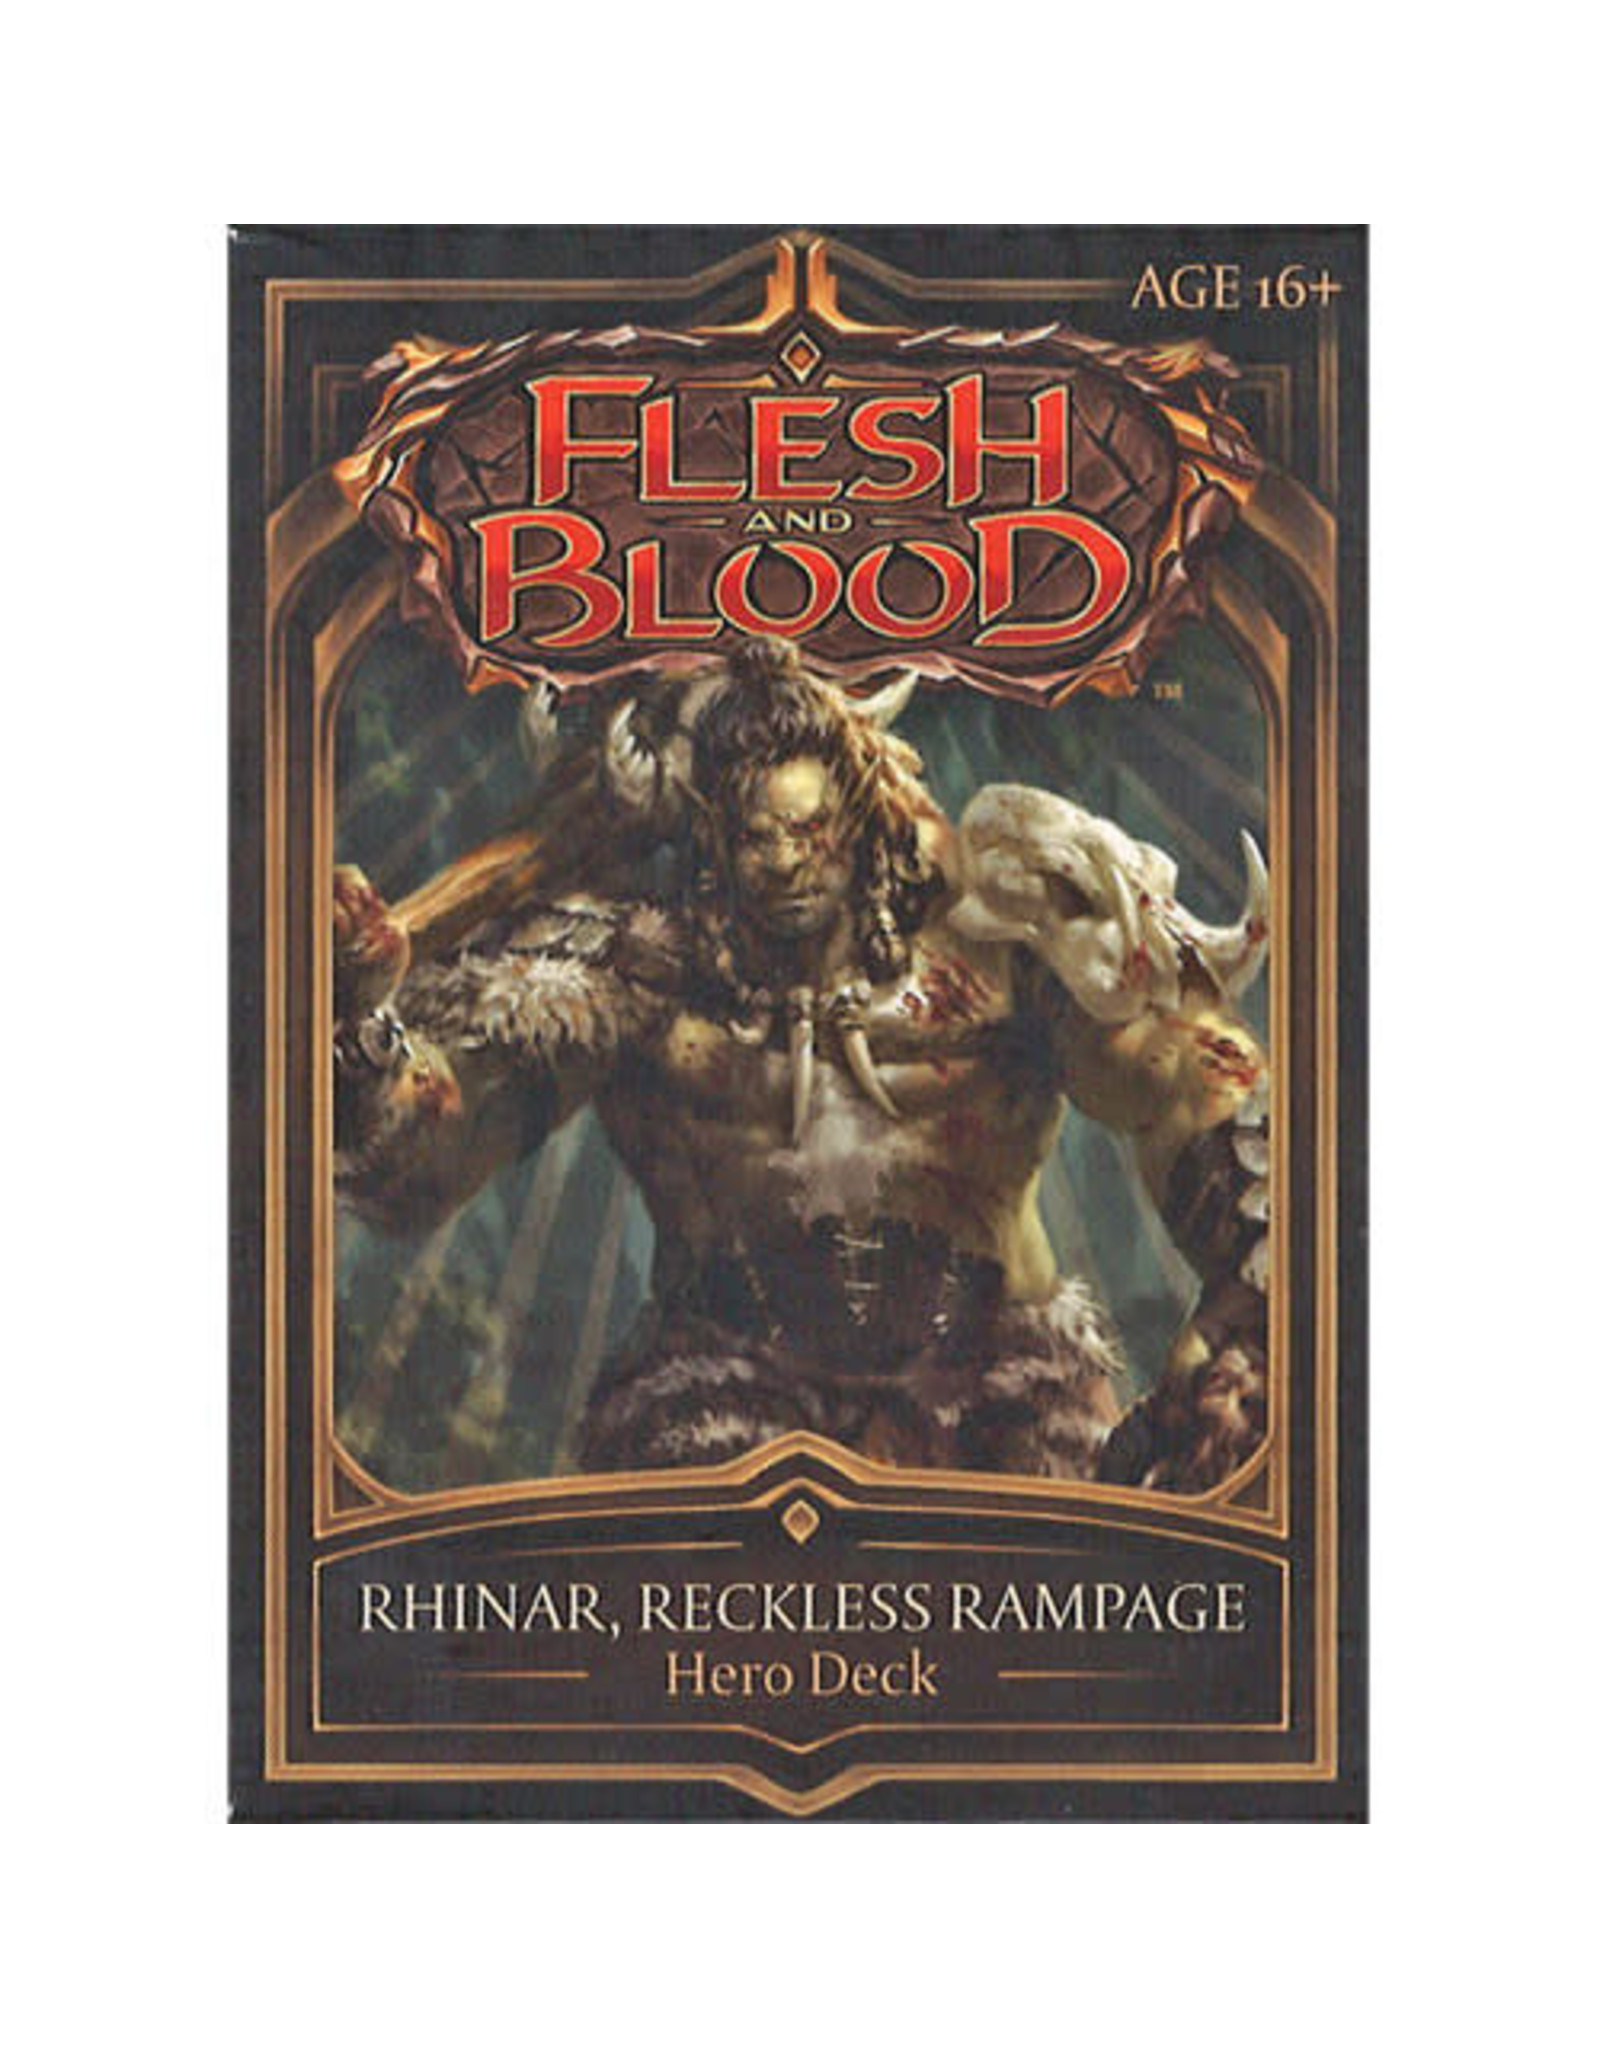 Flesh and Blood: Rhinar, Reckless Rampage Hero Deck